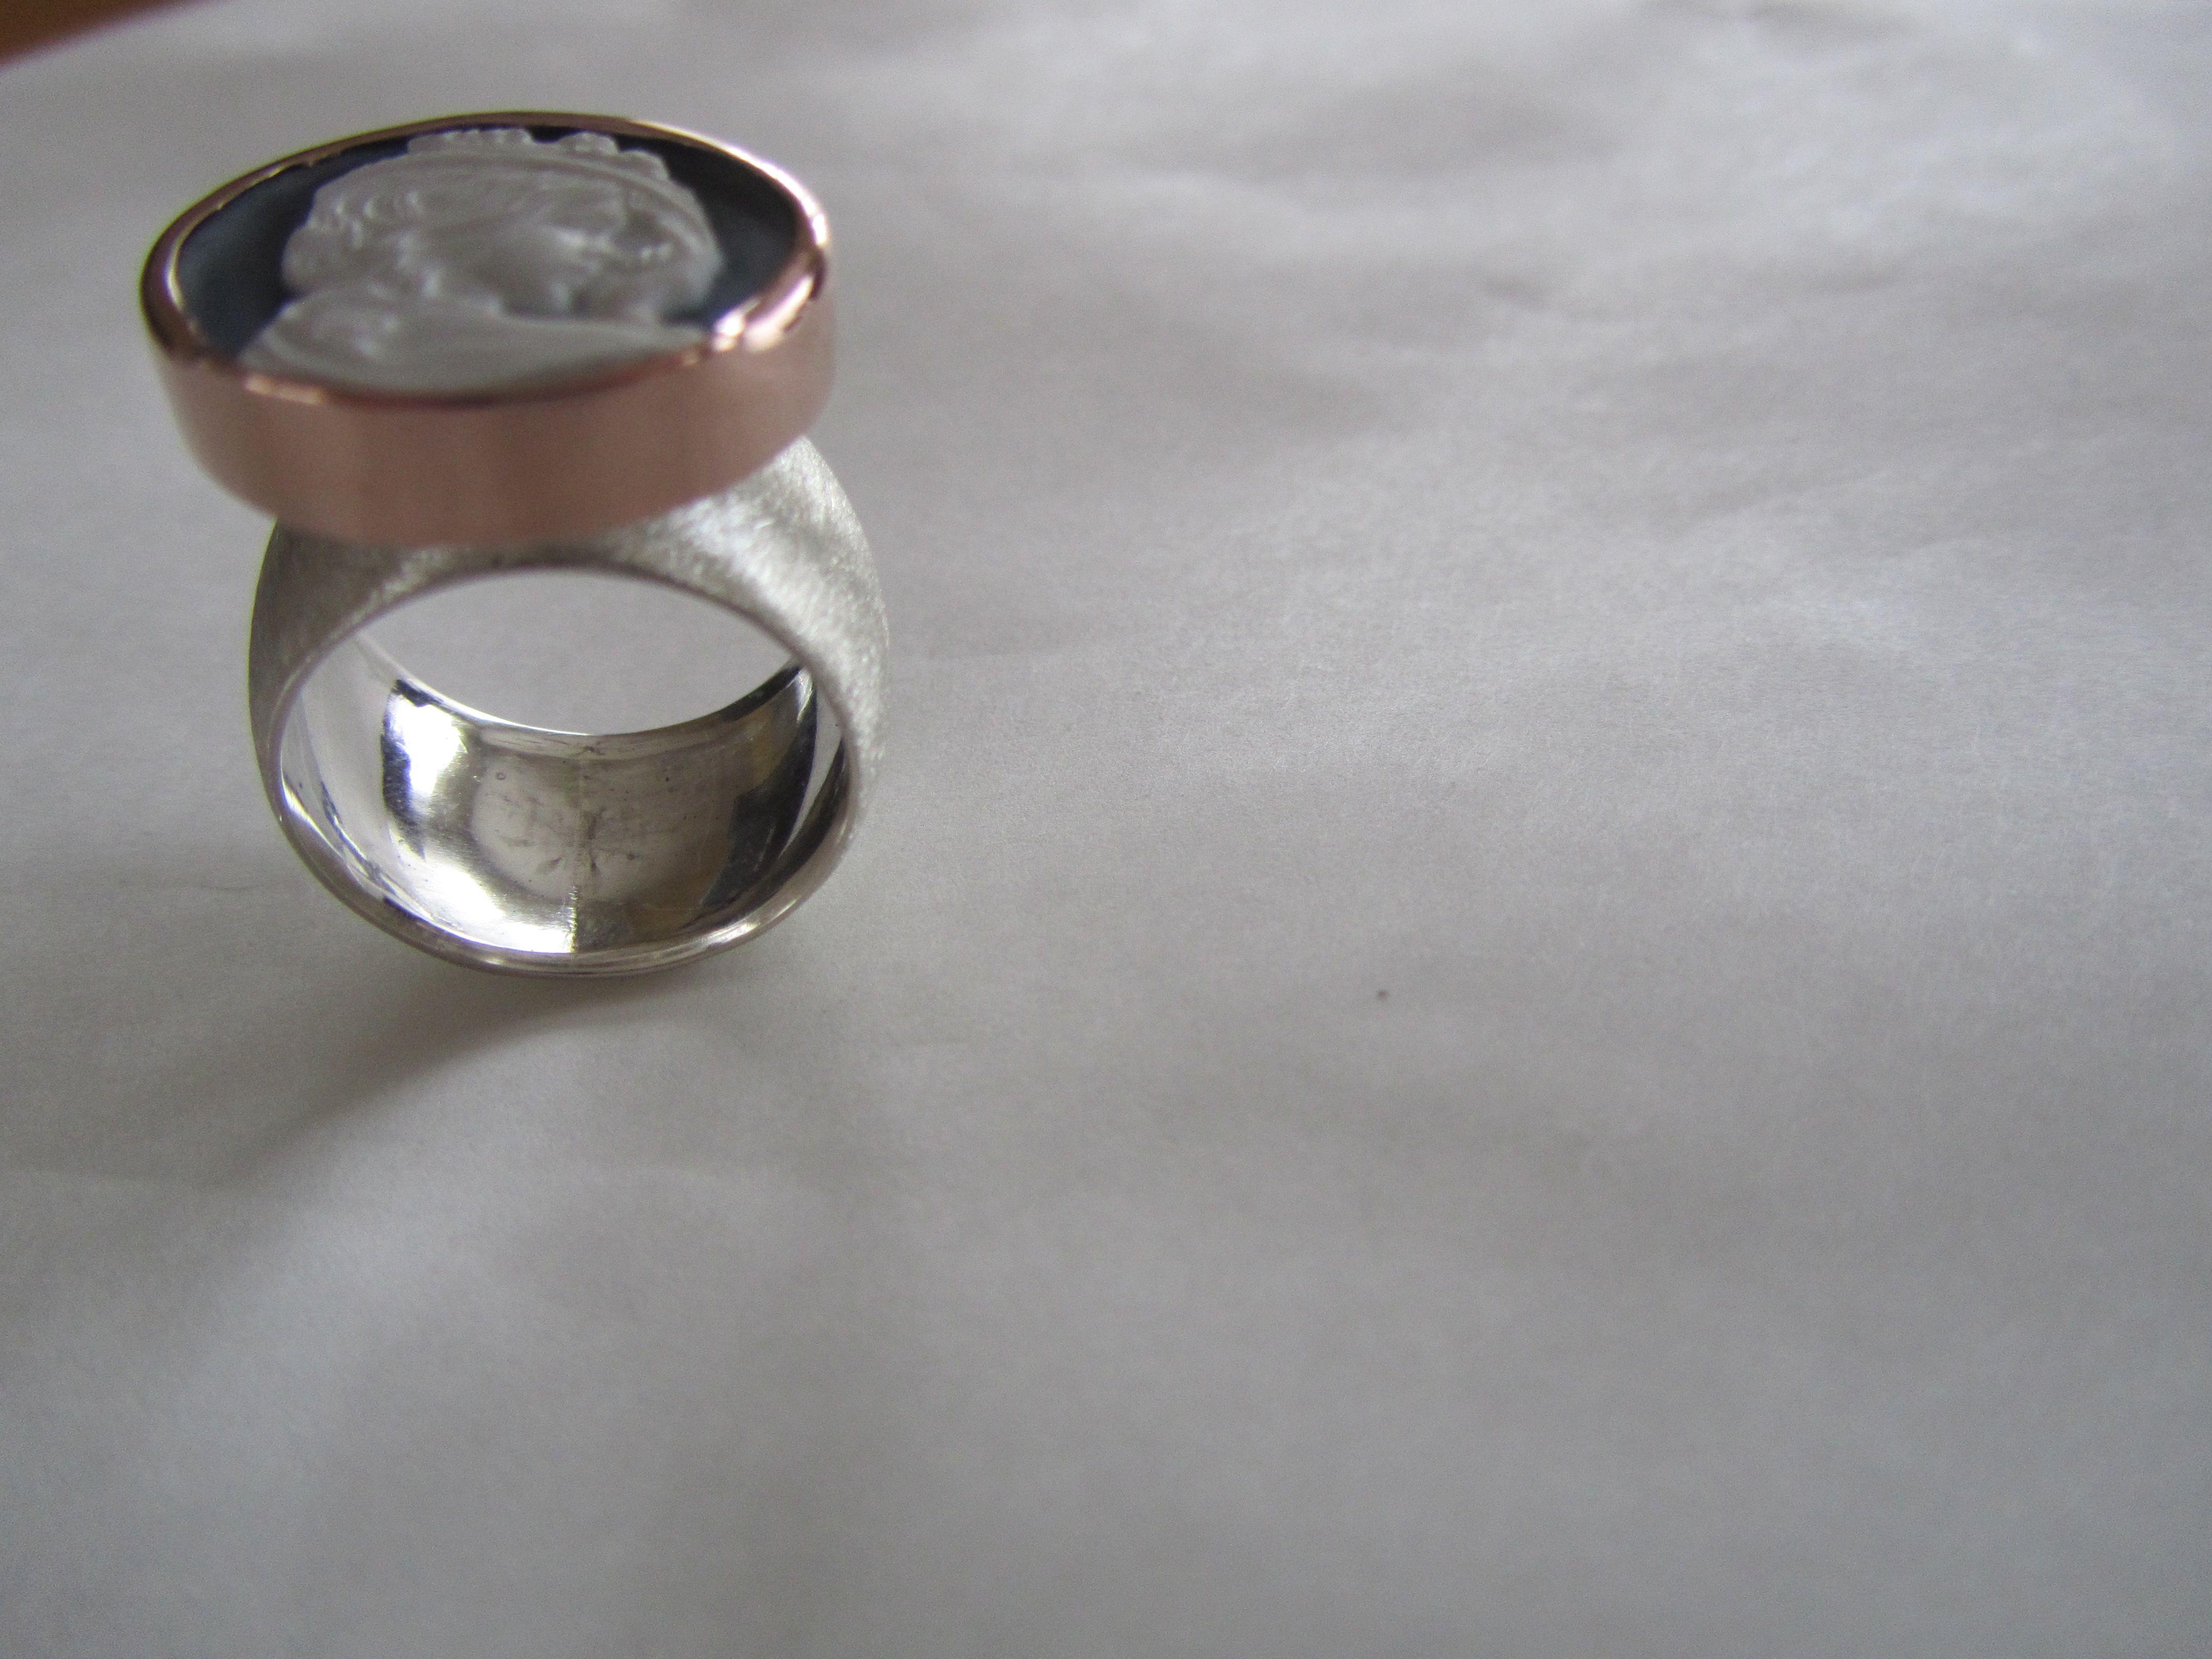 Zilveren gemateerde ring met roodgouden kast en camee. Silver ring with redgold setting and cameo.